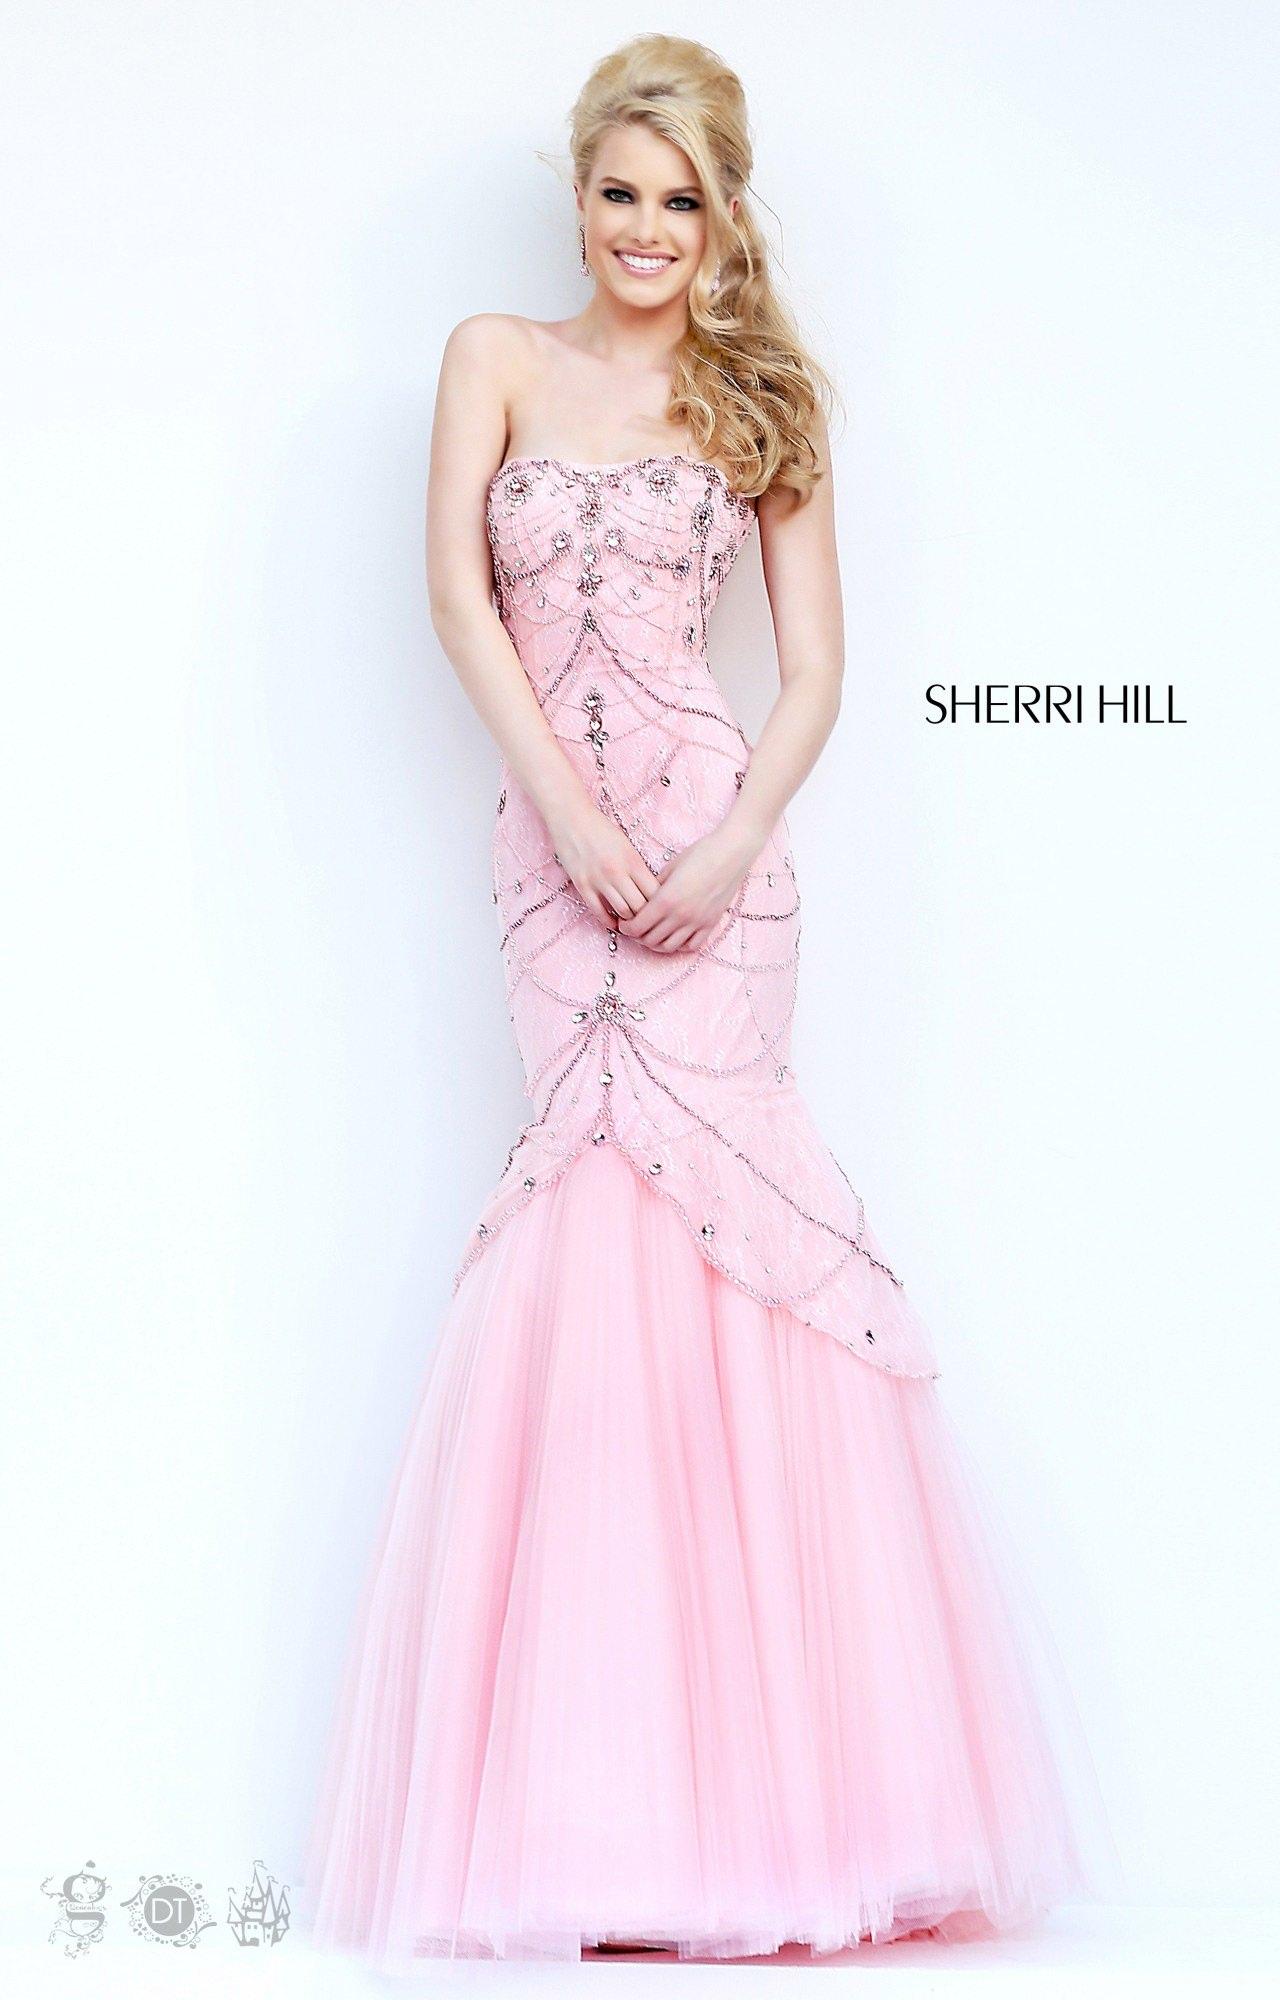 Sherri Hill 32237 - Chandelier Bright Dress Prom Dress